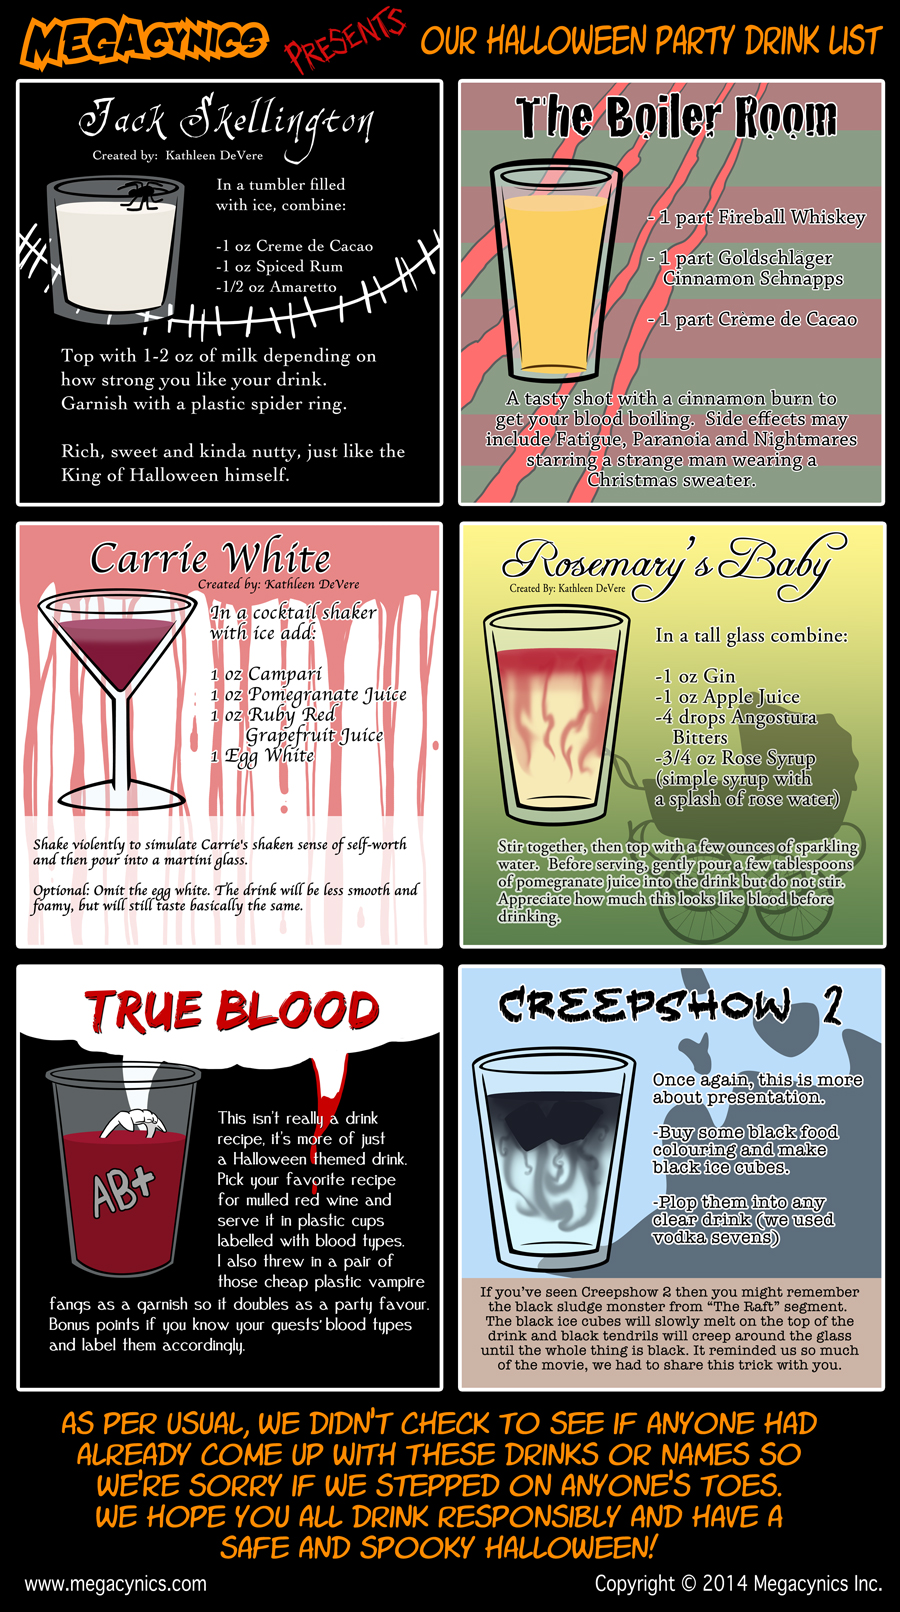 MegaCynics: Halloween Drink List (Oct 31, 2014)